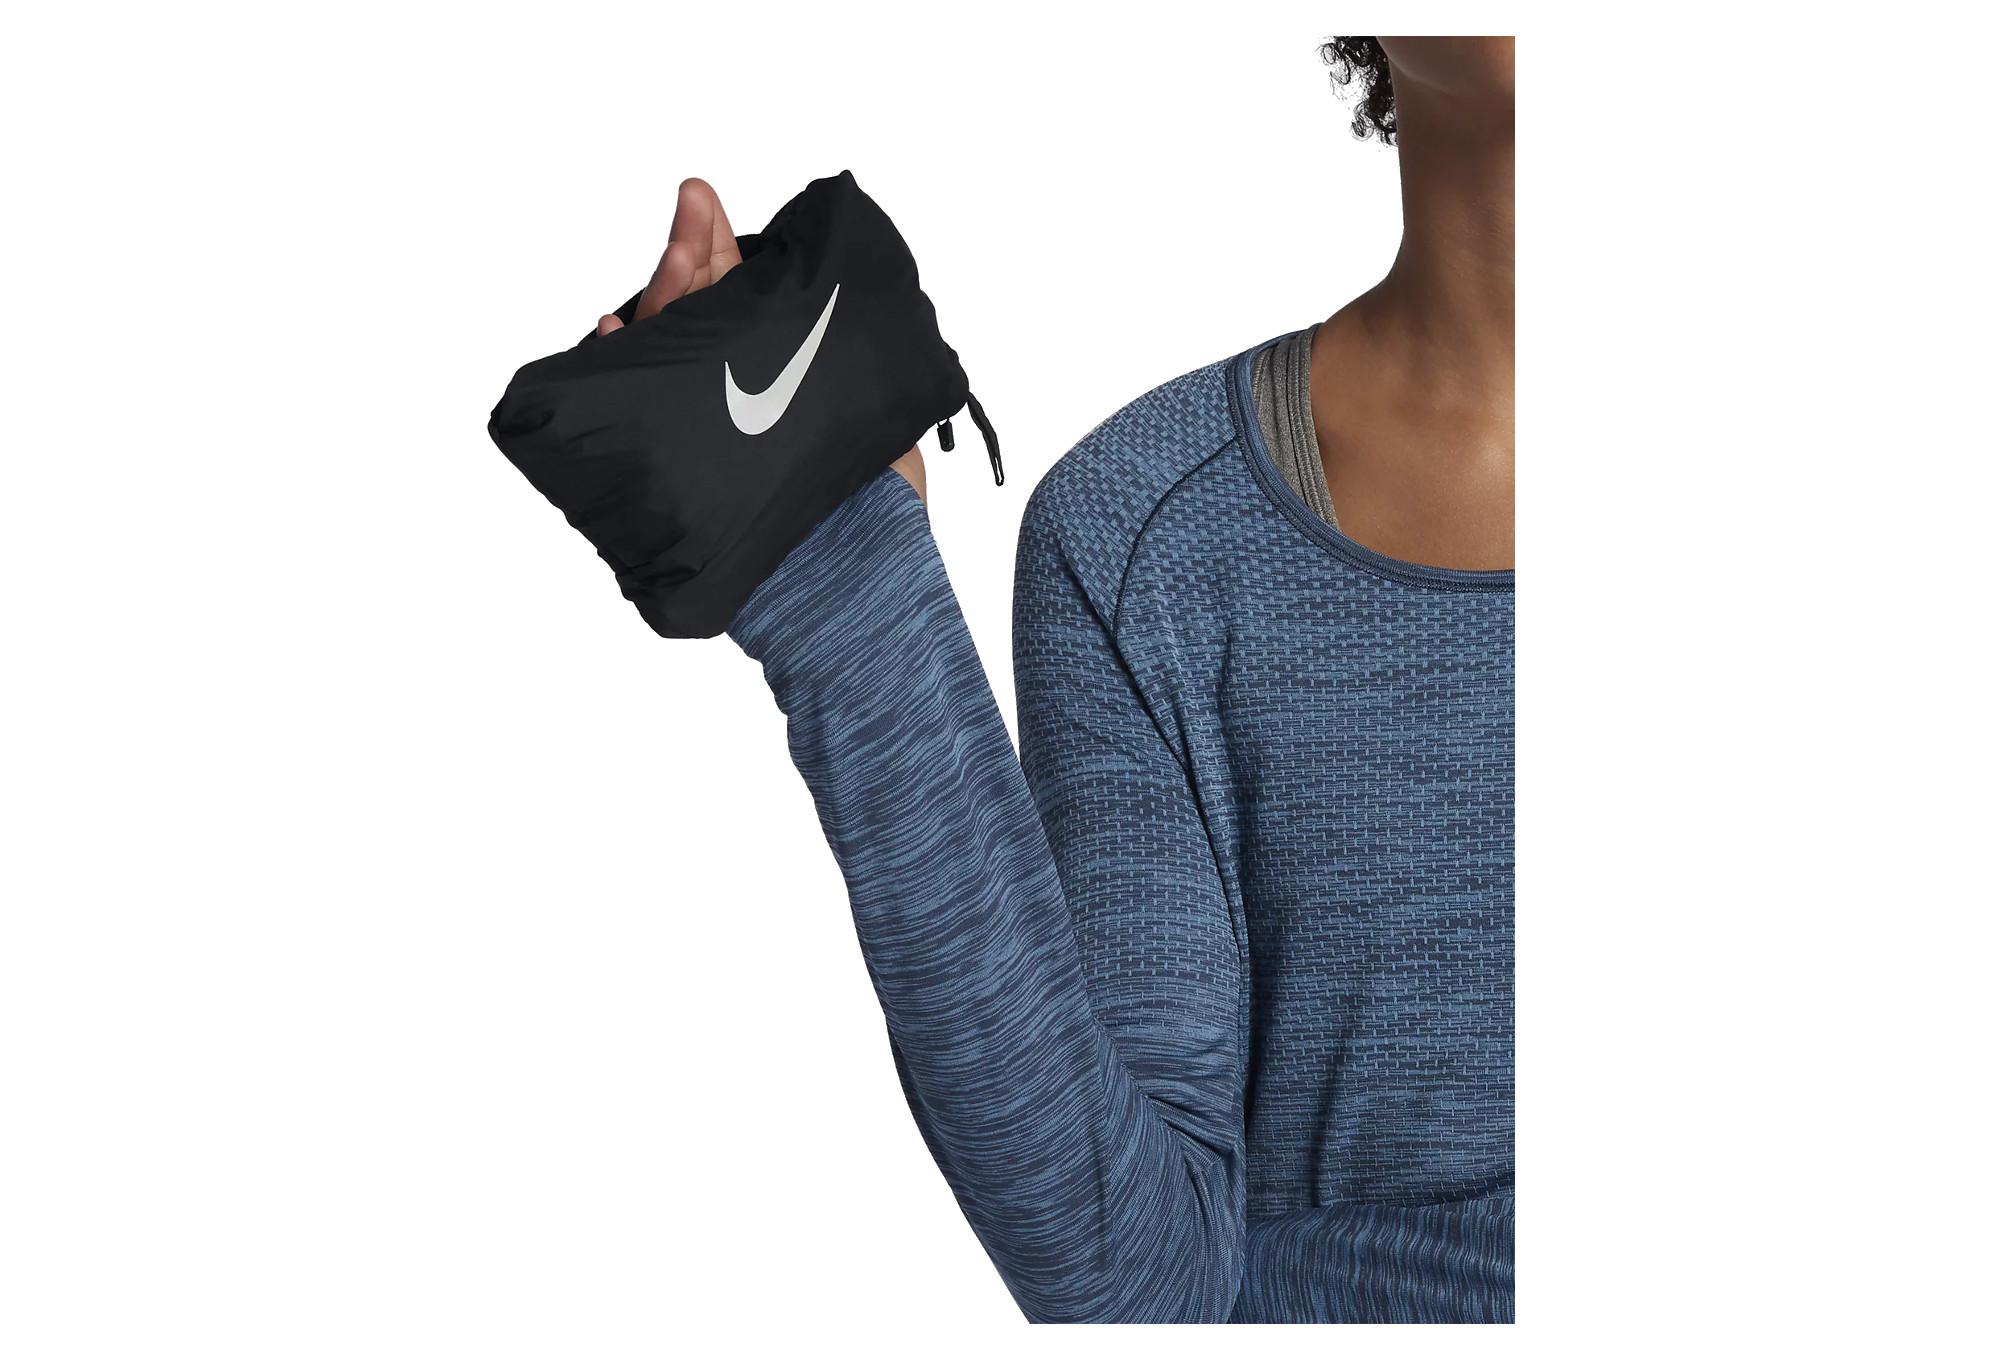 Doudoune Doudoune Doudoune Sans Noir Aeroloft Manche Nike Femme ffw0gr